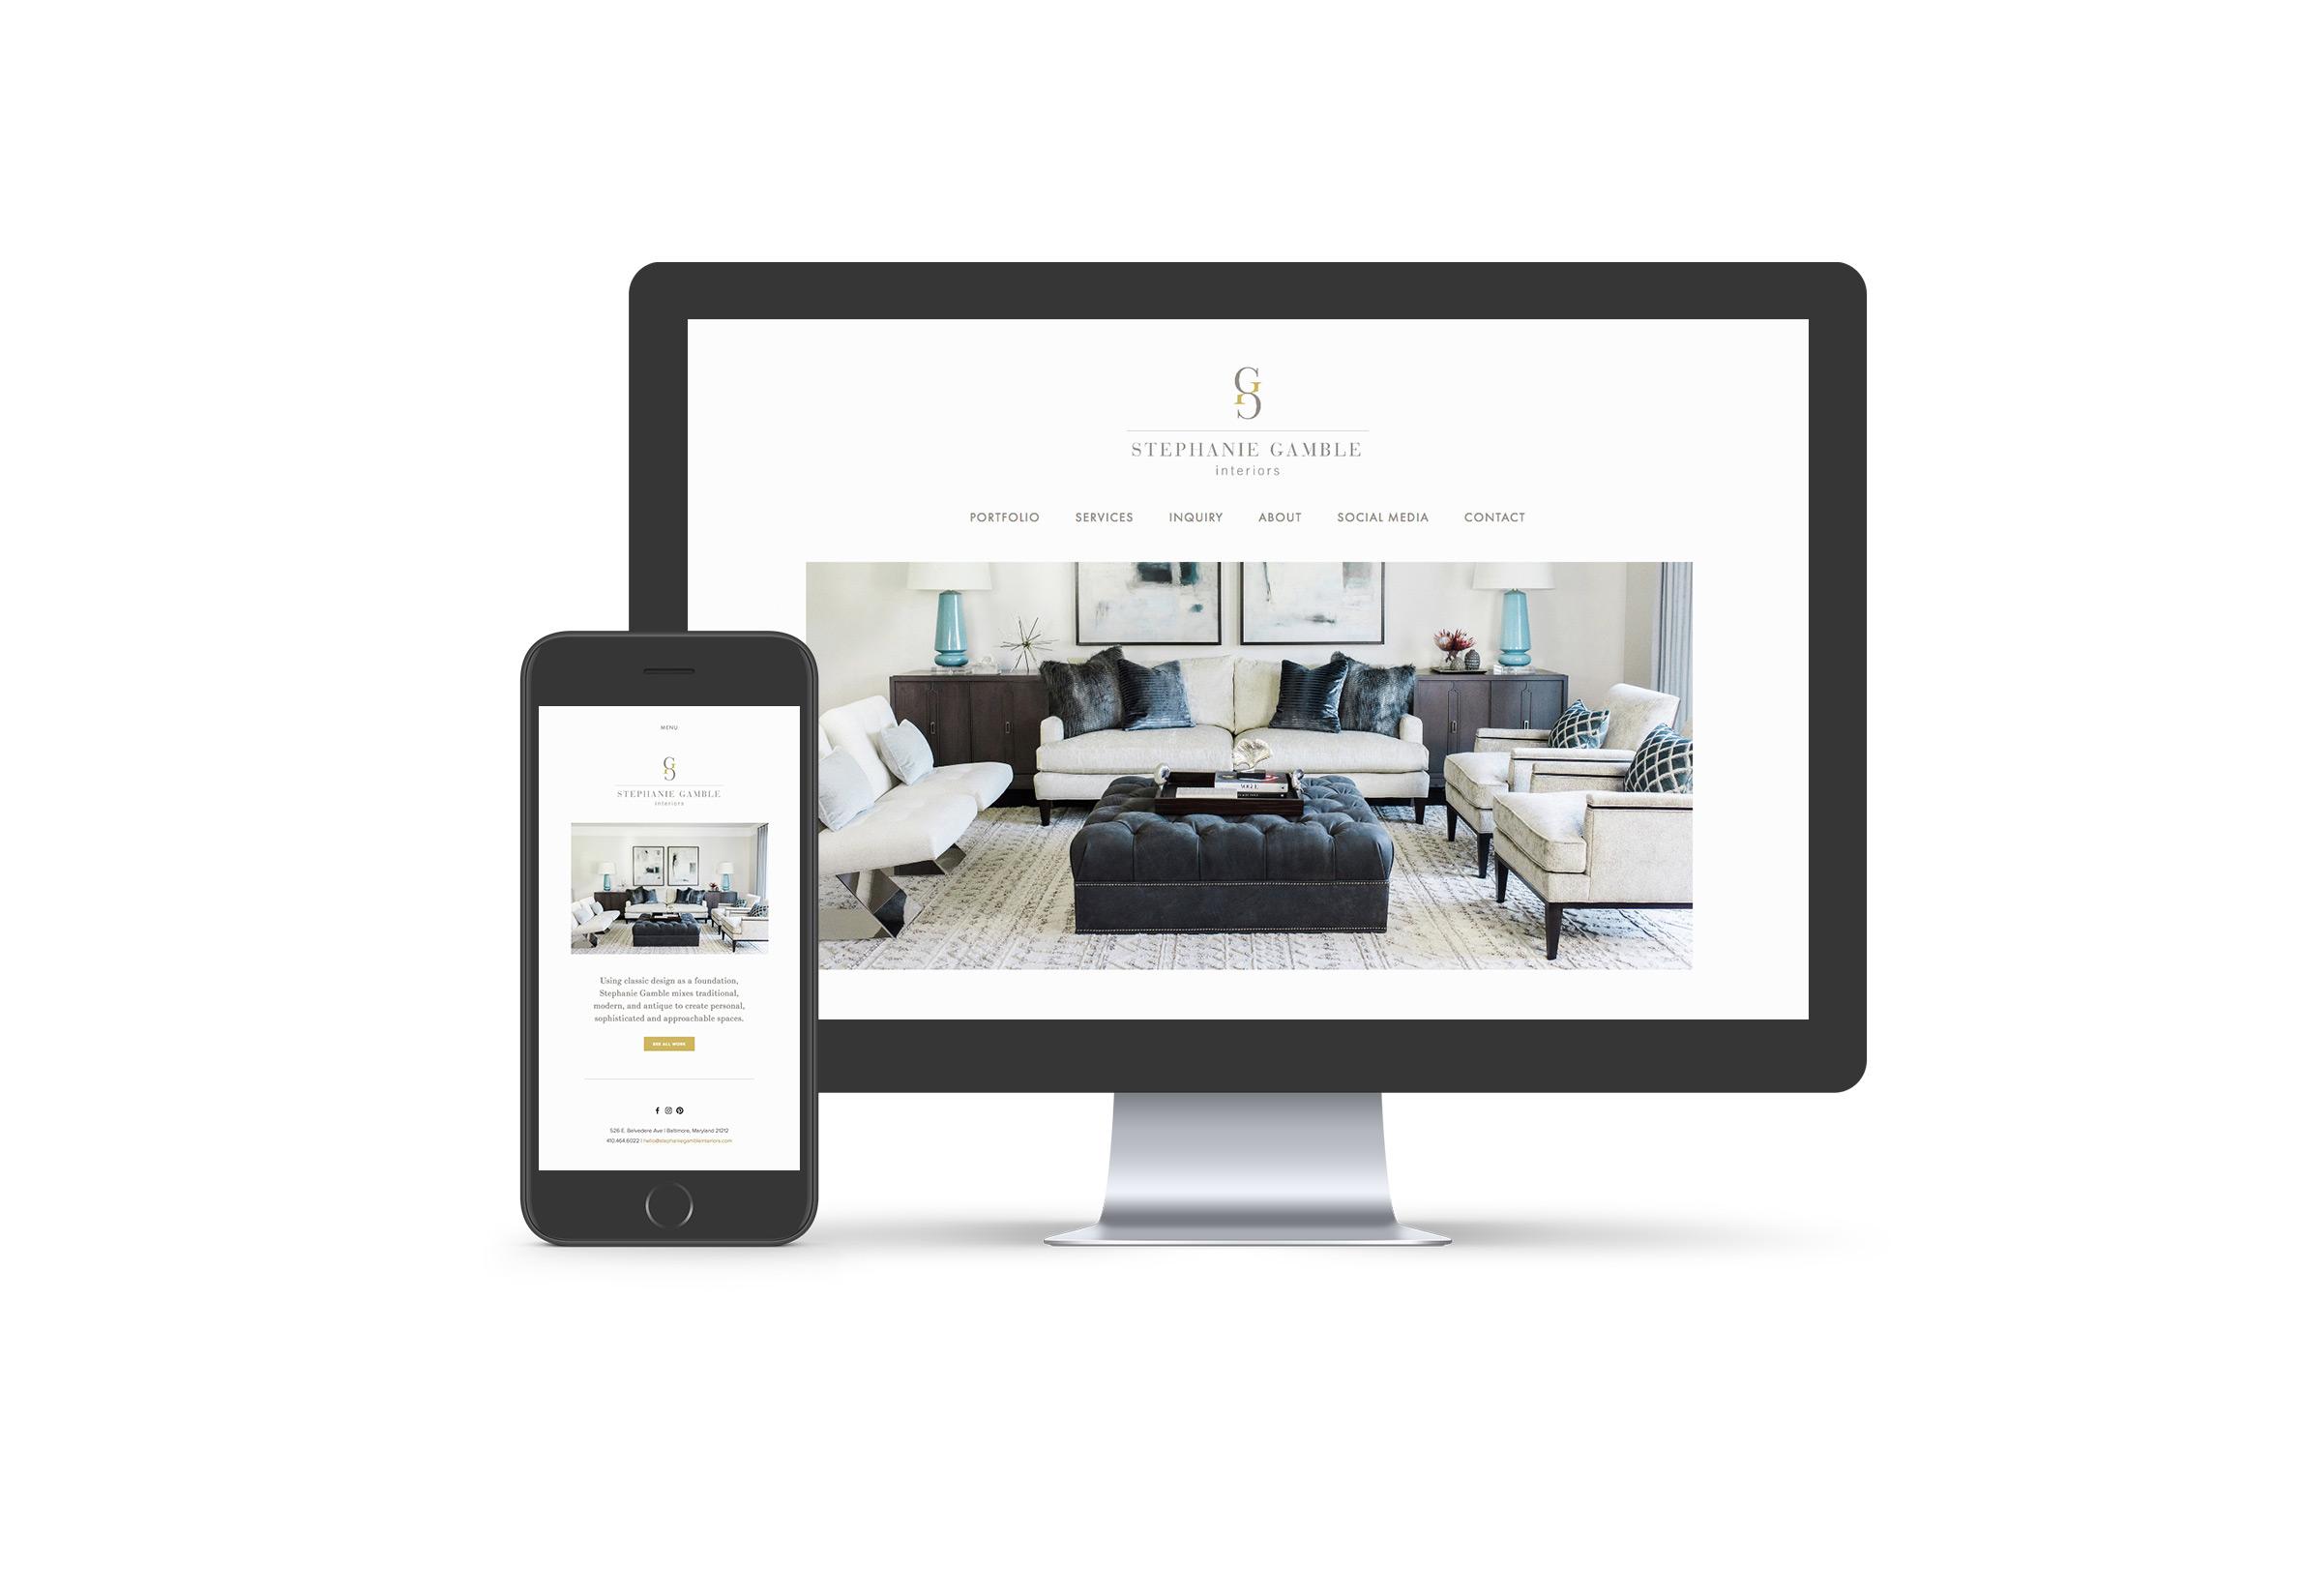 Stephanie Gamble Interiors: Responsive Website Design